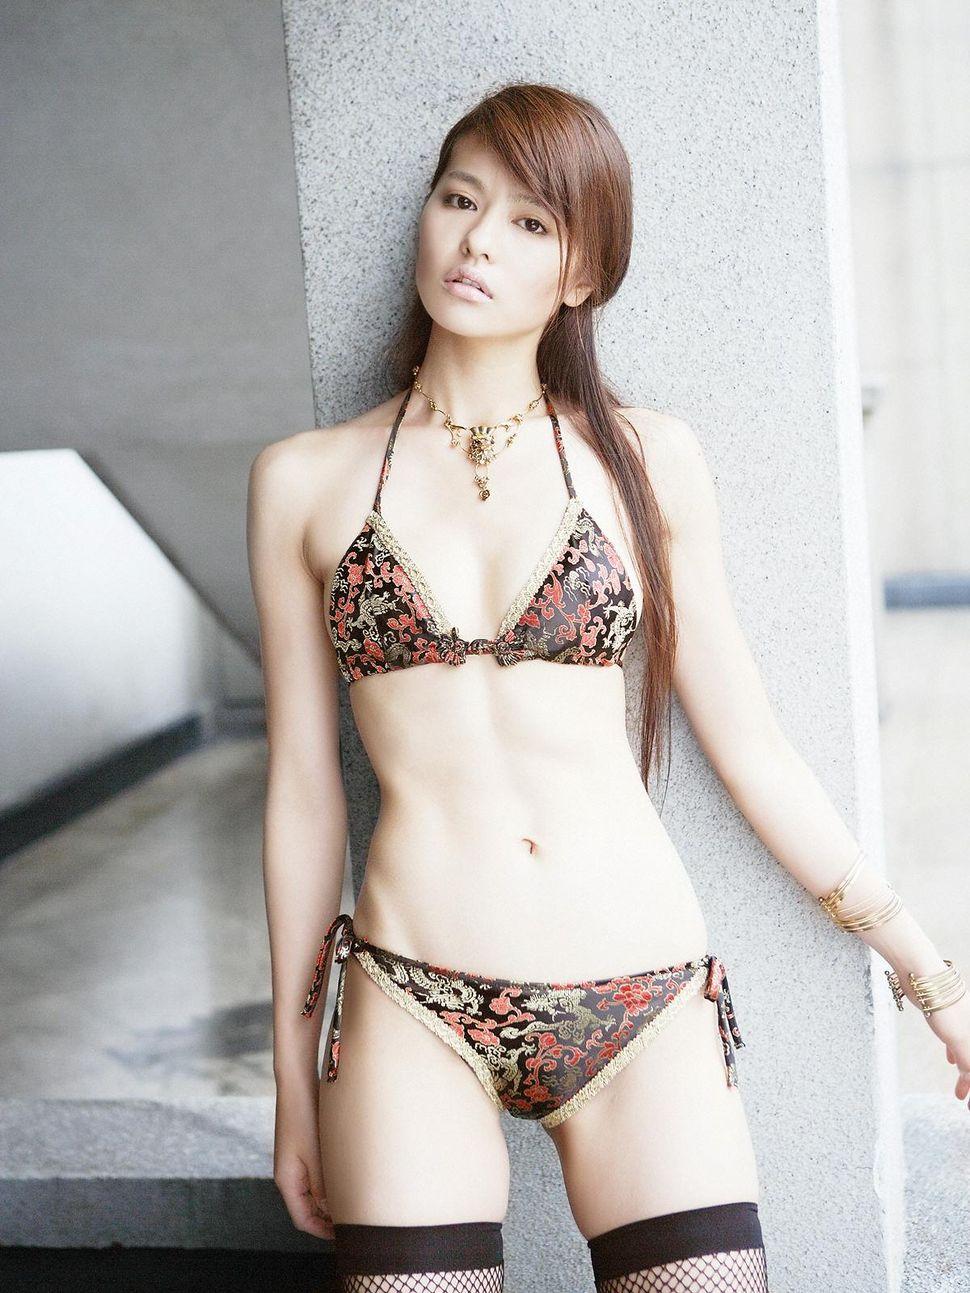 http://blog.cnobi.jp/v1/blog/user/a8c5c06266ed65ea9b67299e90592fa7/1296227642